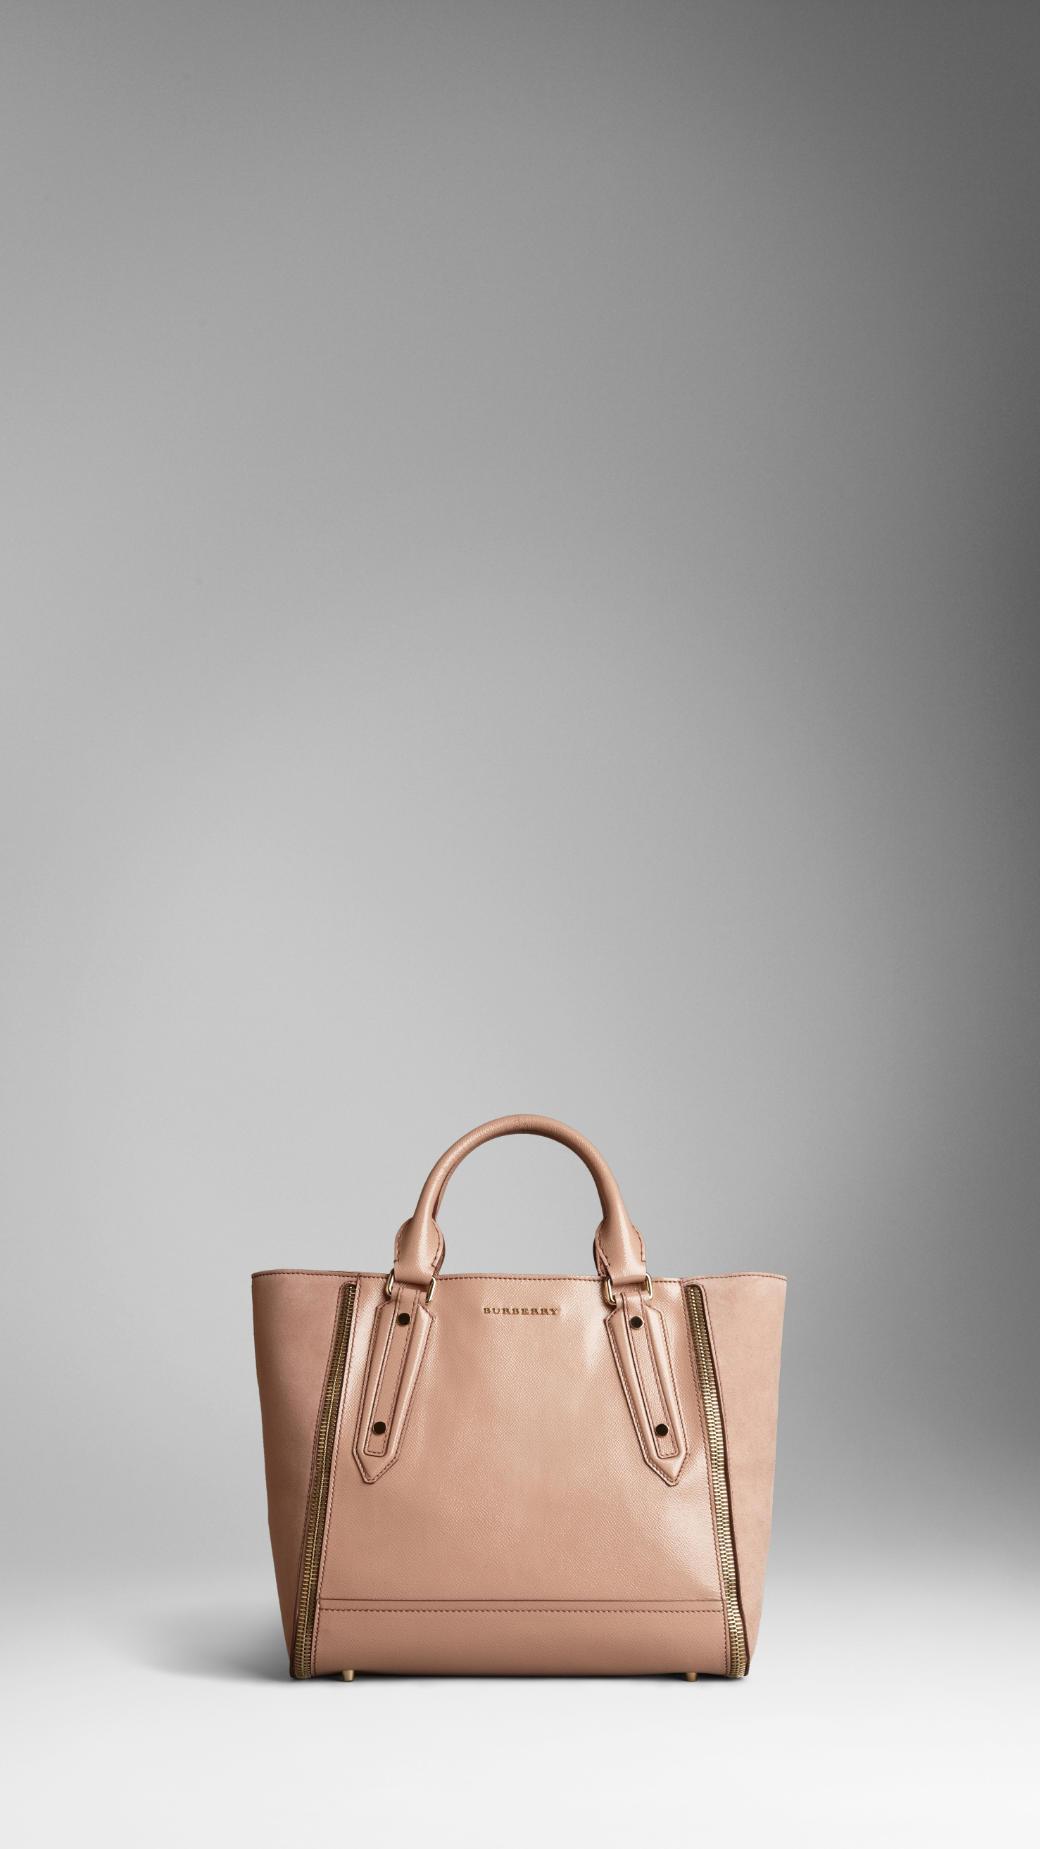 Burberry Medium London Leather Zip Detail Tote Bag in . f6f2c1e751a7e